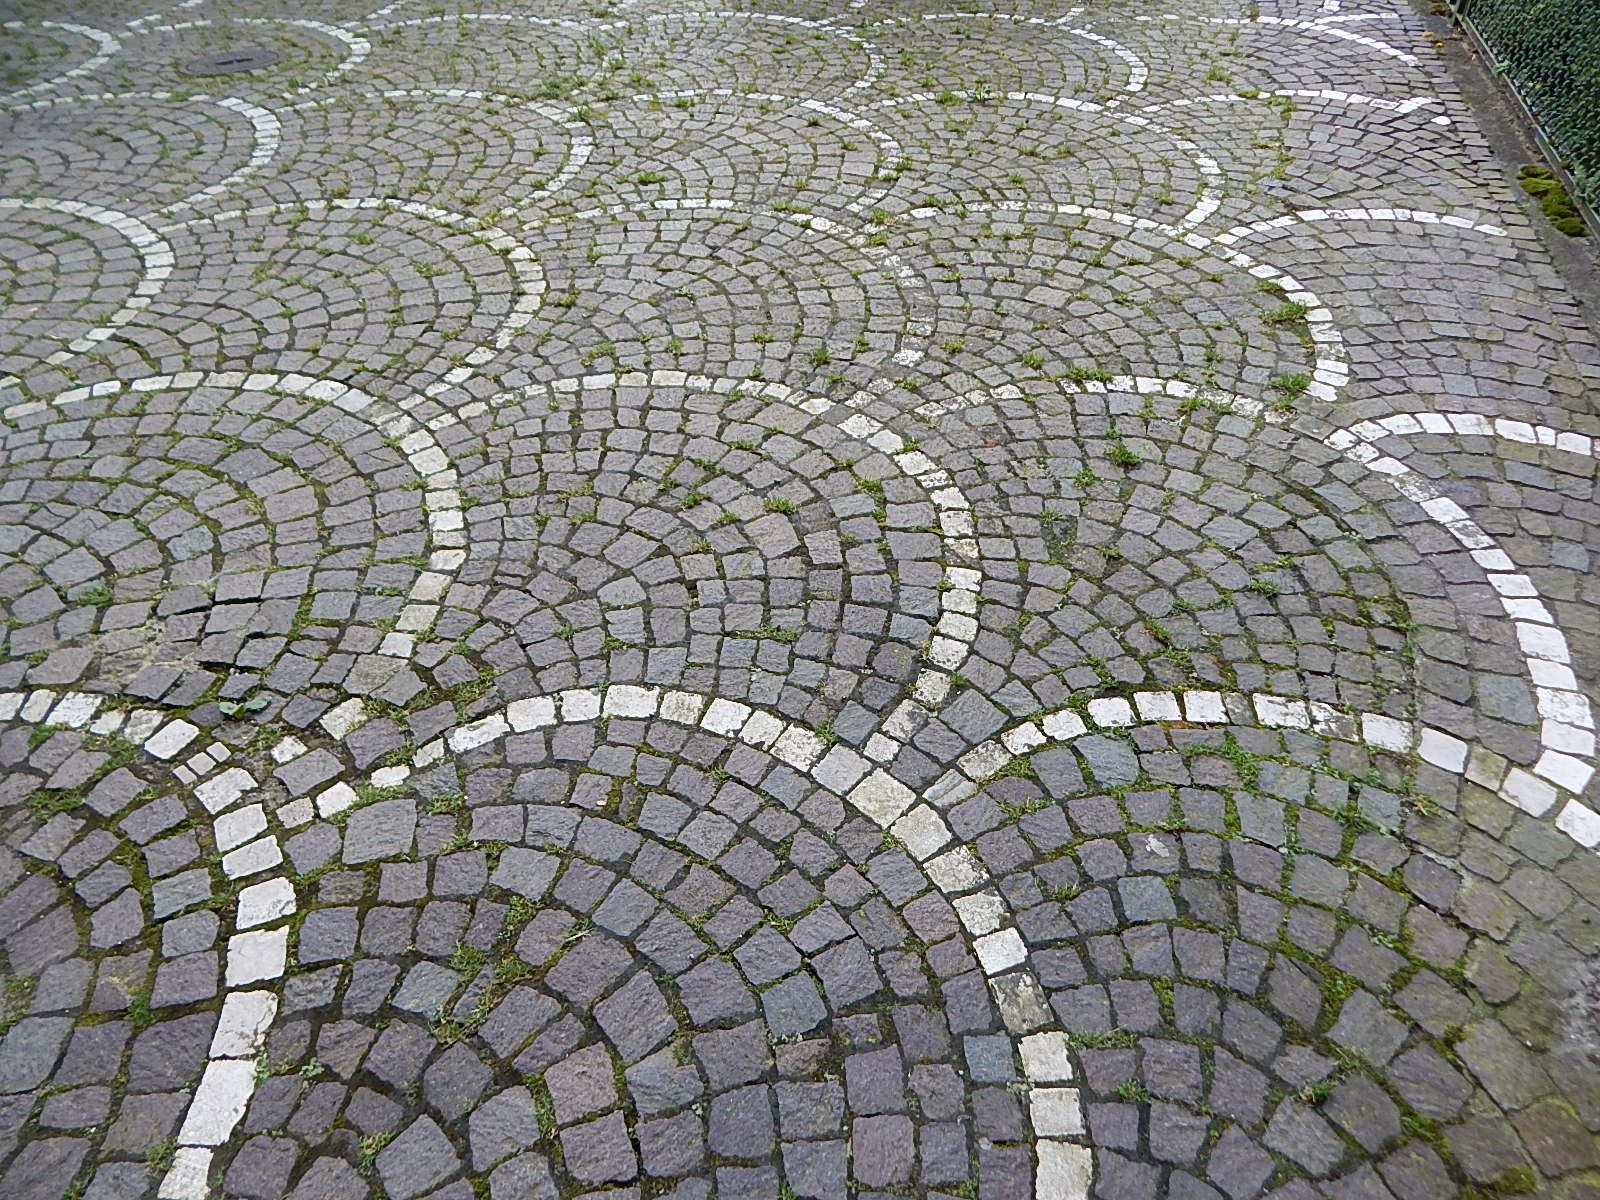 Explore Pavement Floorore Nice Fan Scallop Pattern Using Cobblestone